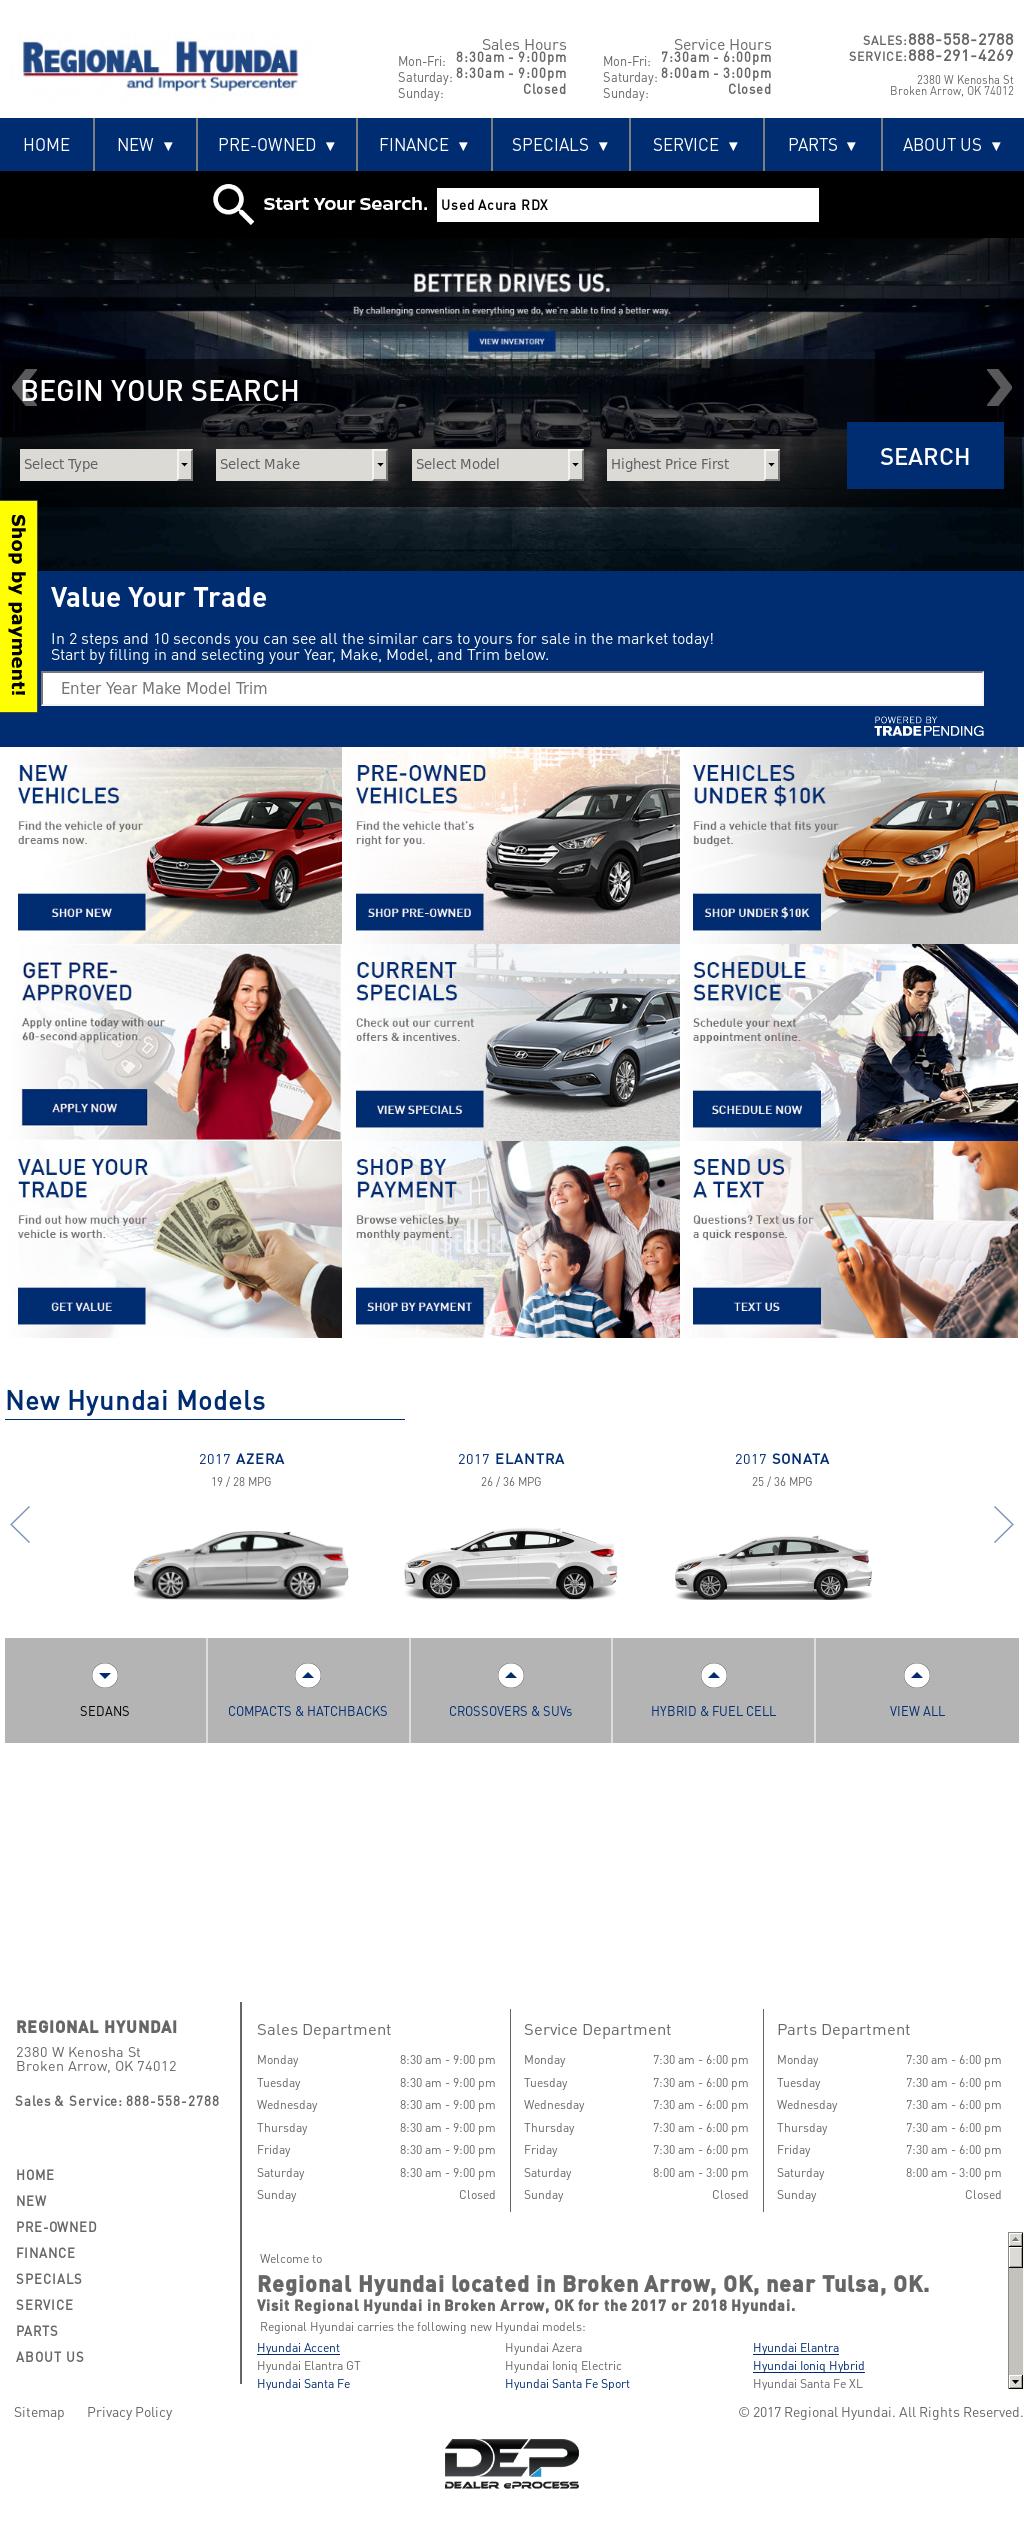 Regional Hyundai Website History